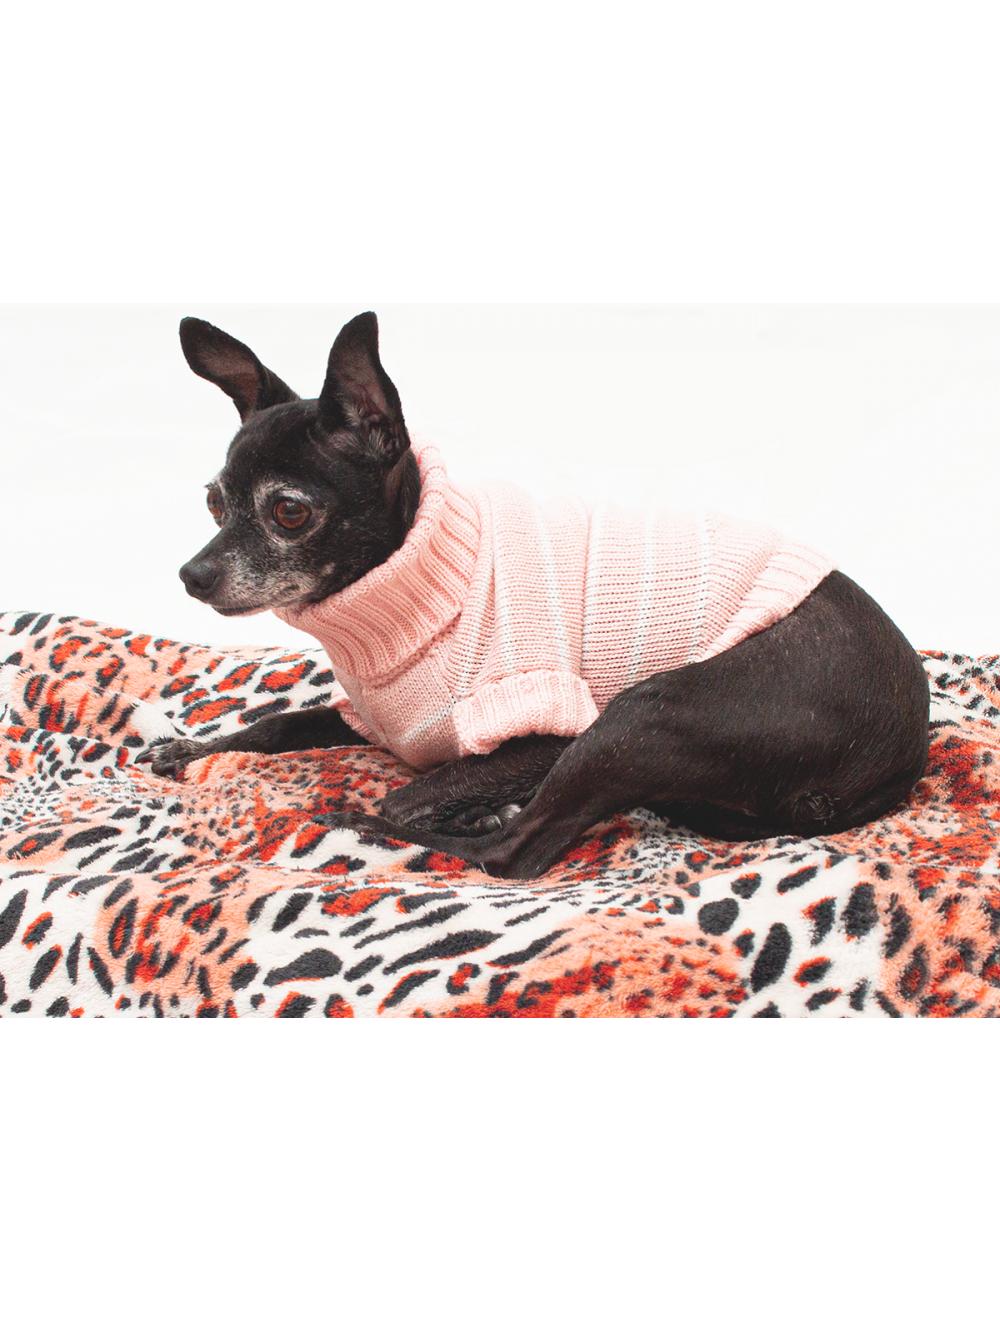 Saco Mandy para Perros Rosa Talla XL  - Ciudaddemascotas.com